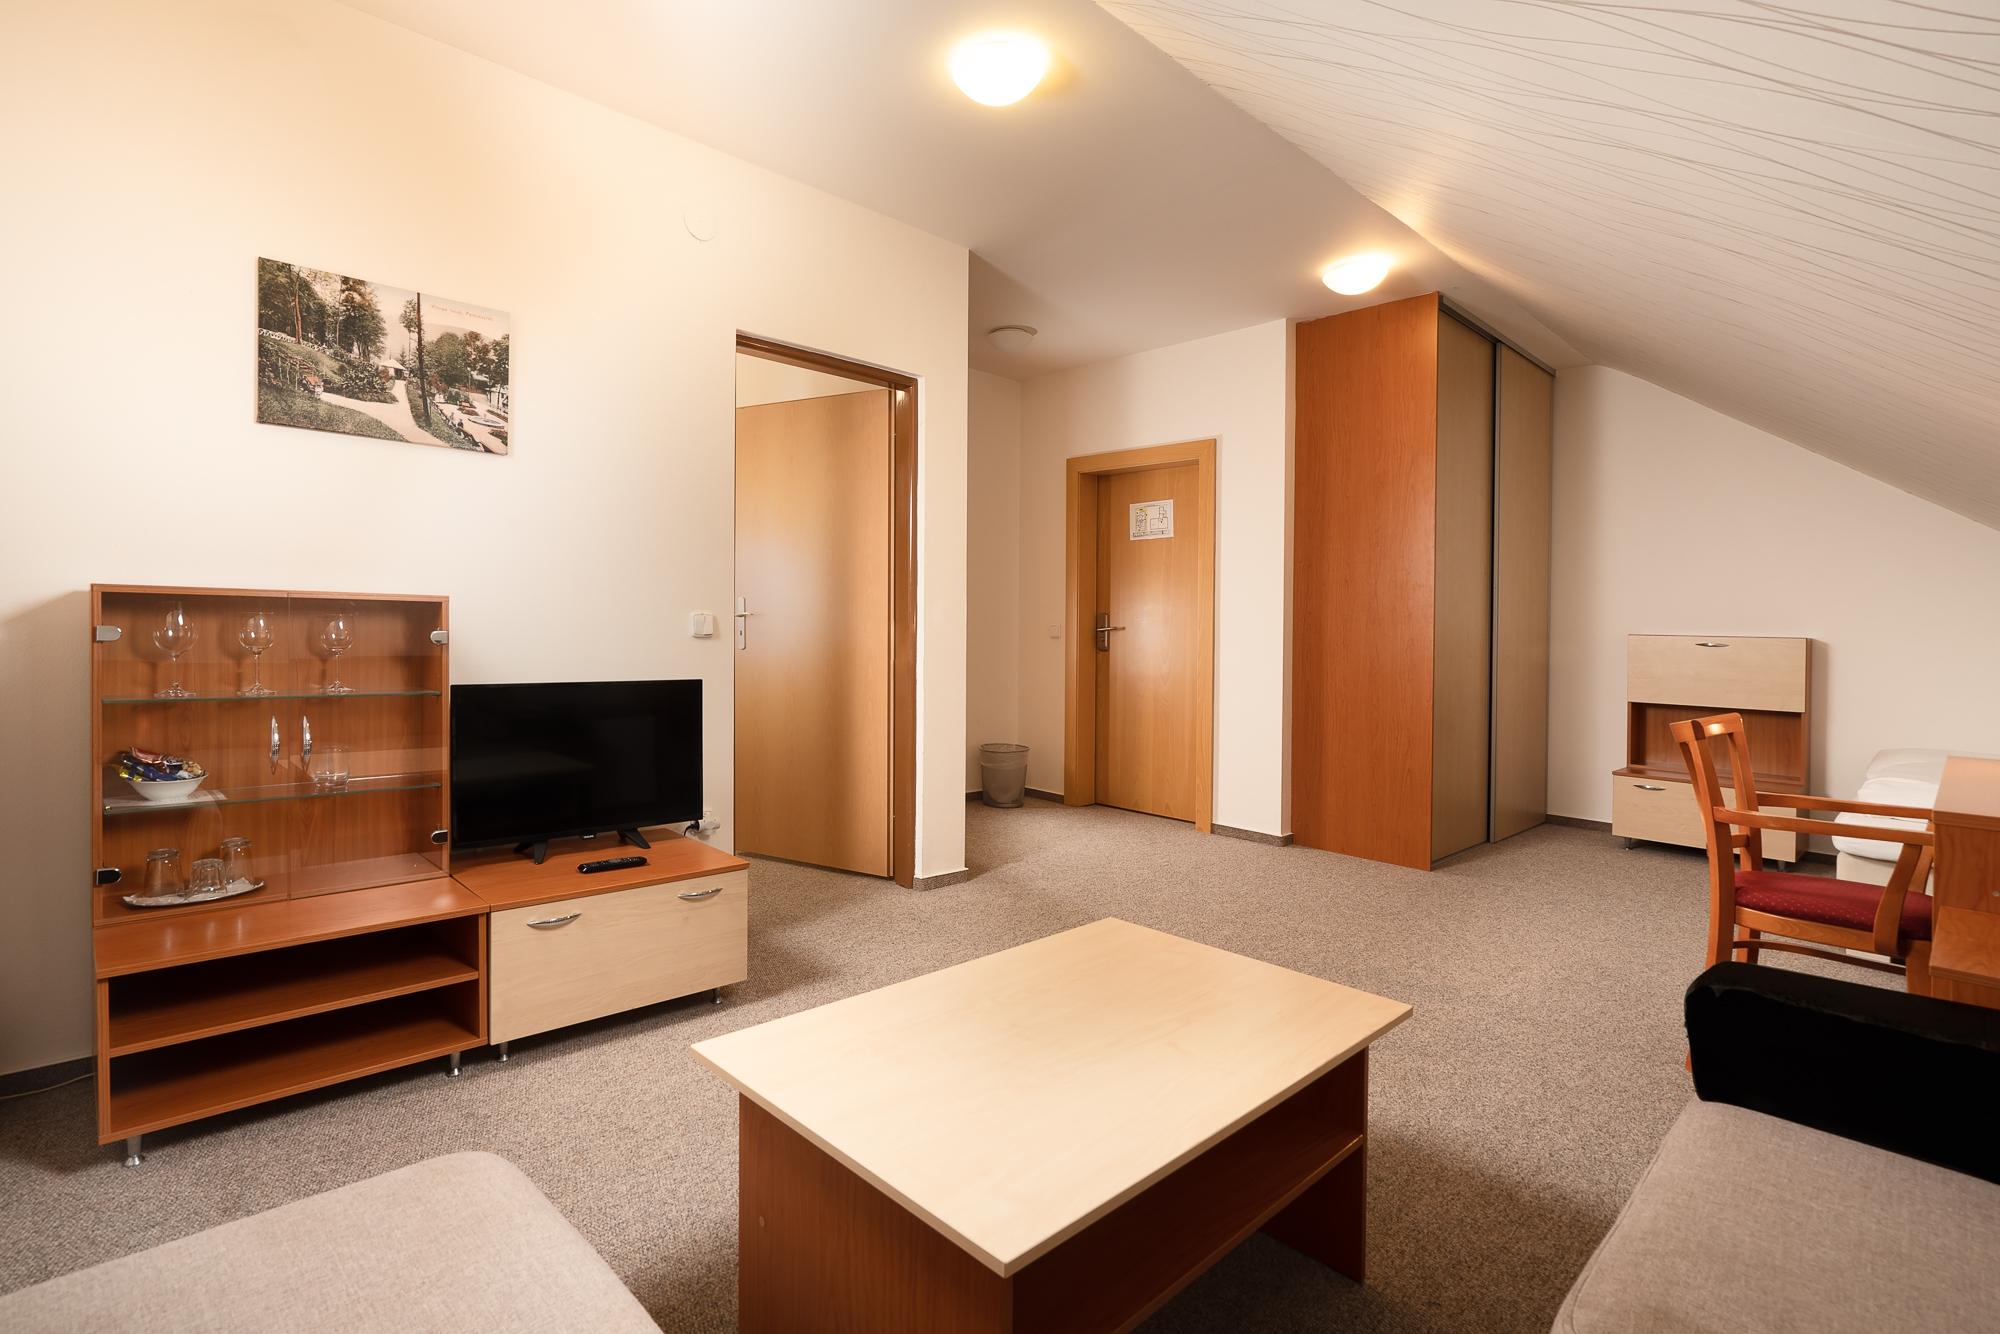 https://cms.satur.sk/data/imgs/tour_image/orig/hotel_termal_vyhne-42-1802509.jpg